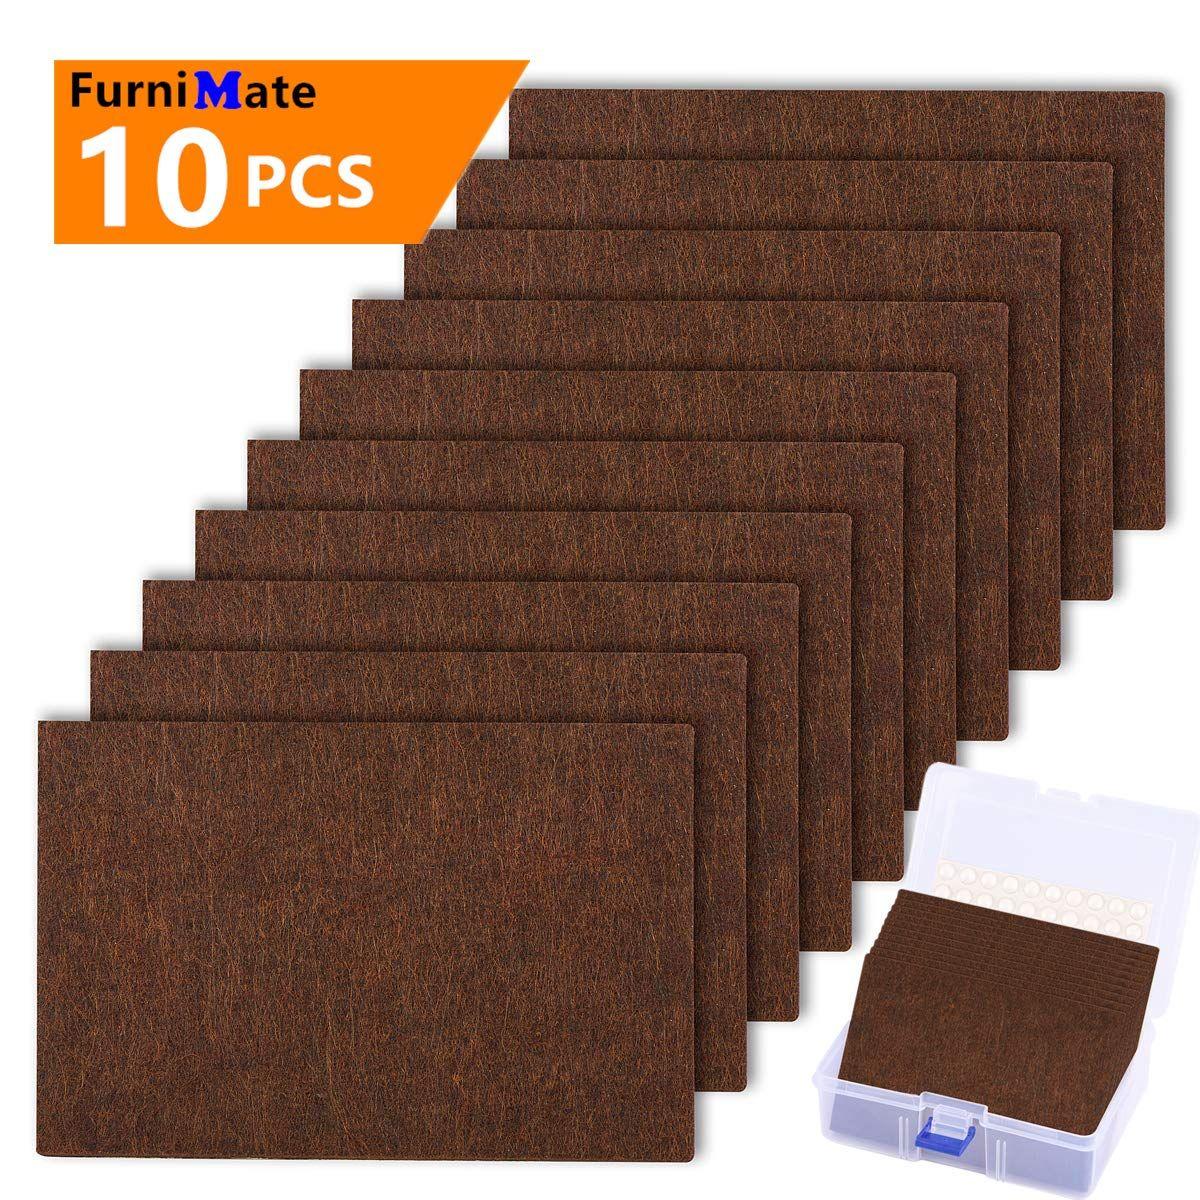 Furniture Felt Pads Sheets 10 Pieces Pack 6 X 4 Large Felt